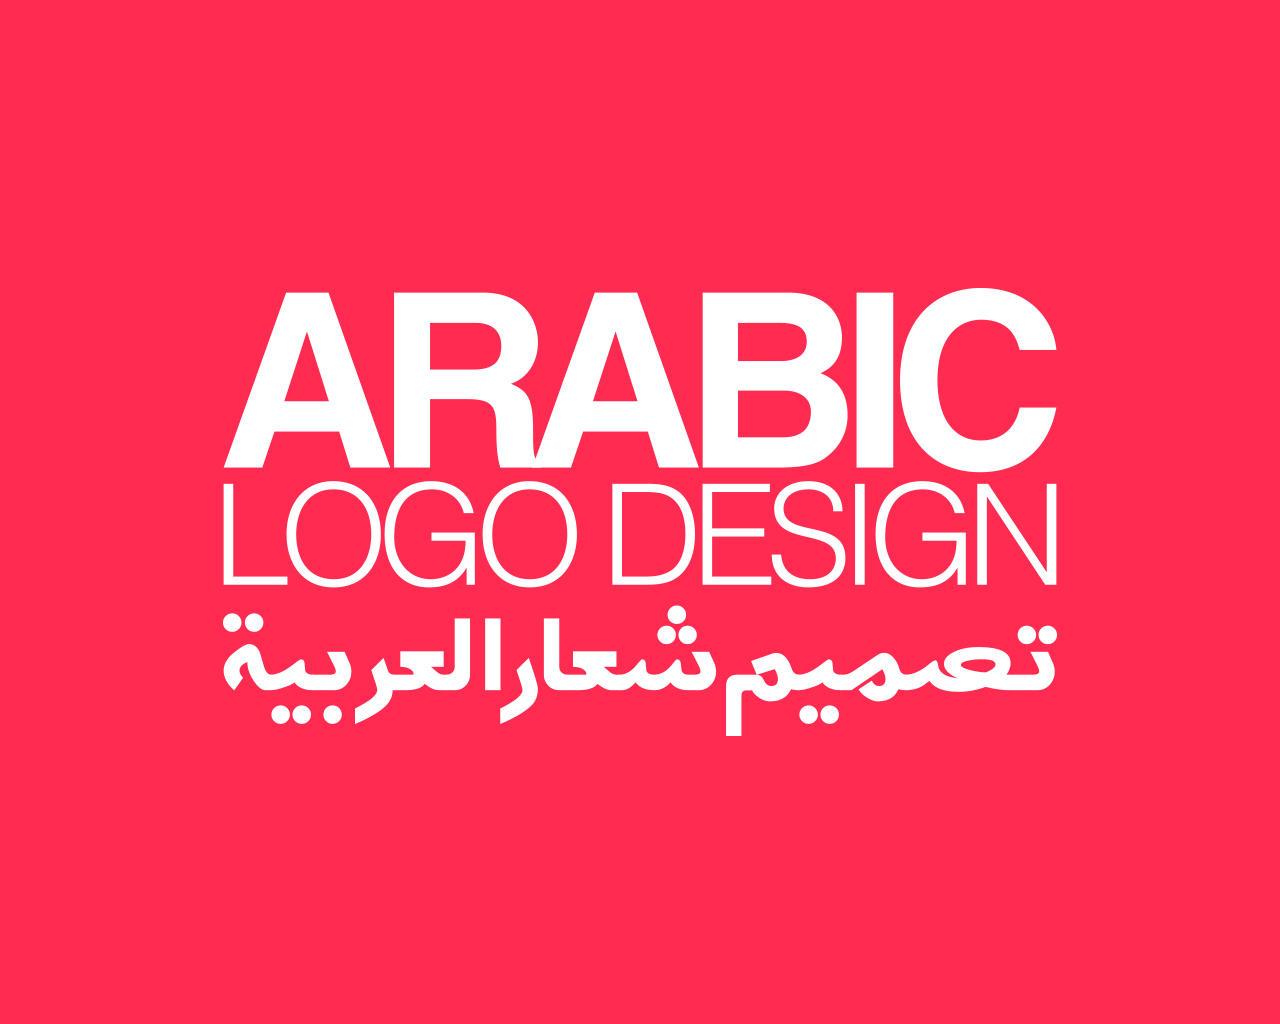 Arabic Logo Design Calligraphy